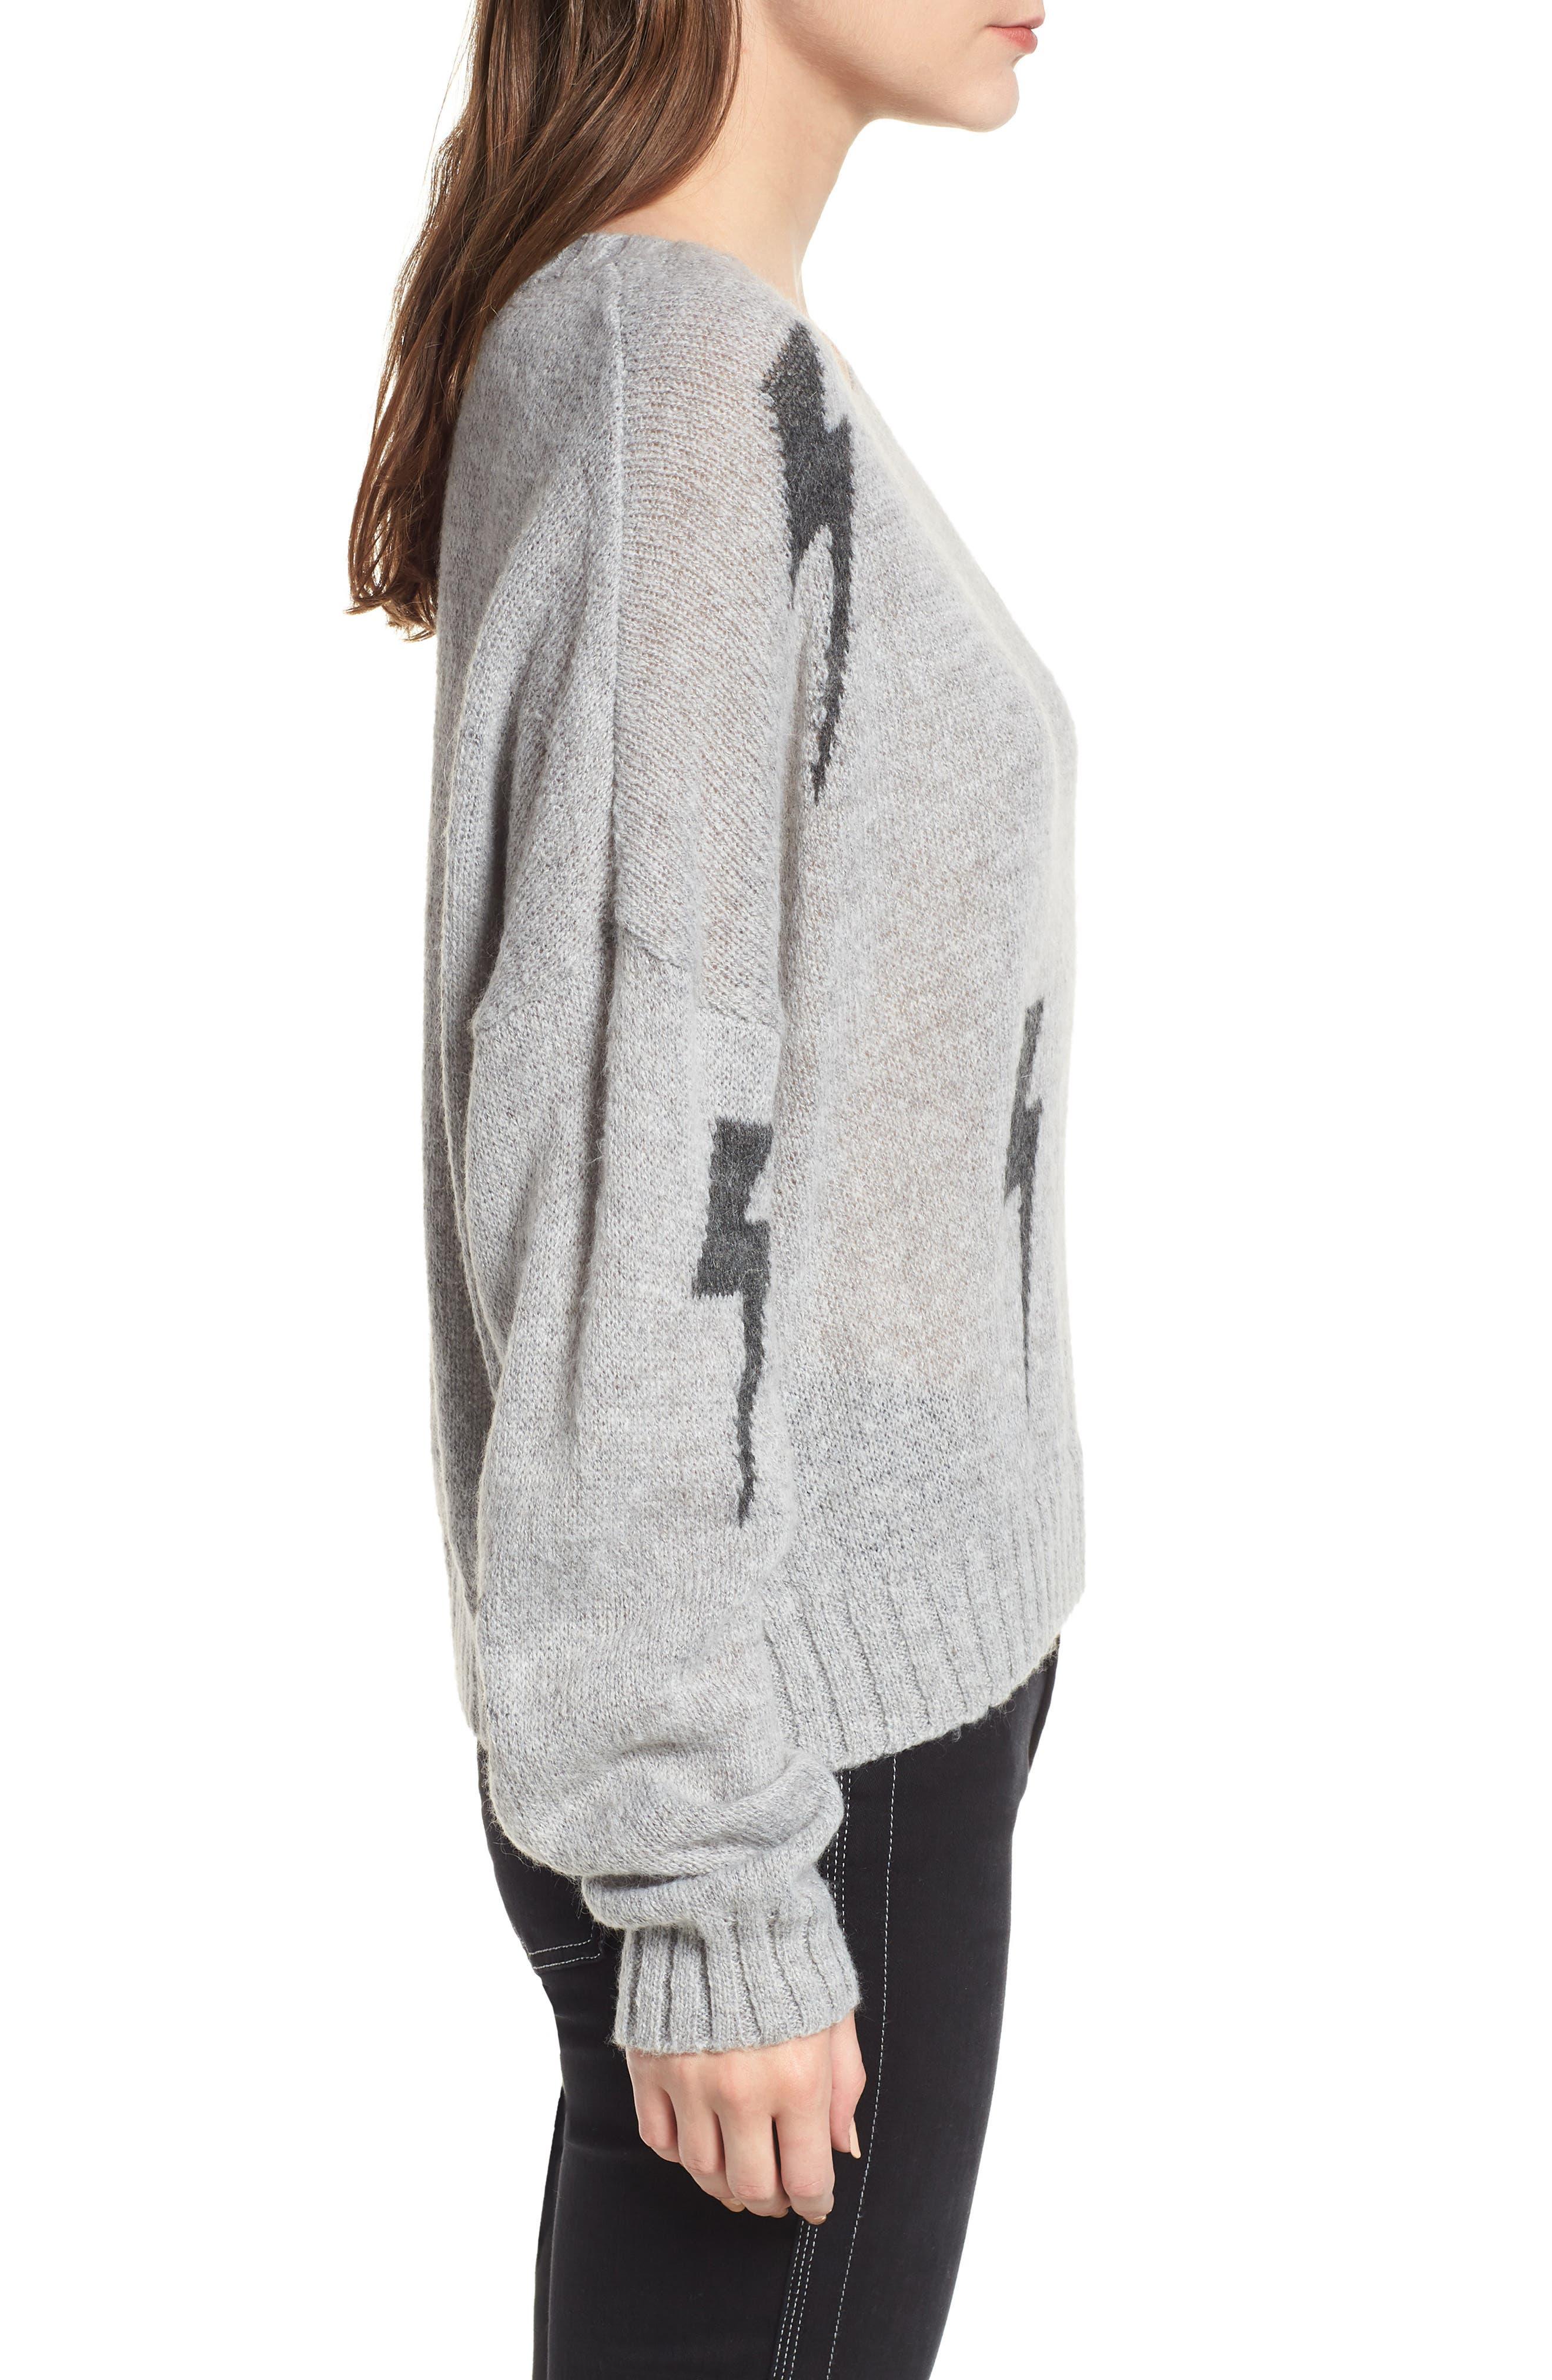 Perci Sweater,                             Alternate thumbnail 4, color,                             GREY/CHARCOAL LIGHTNING